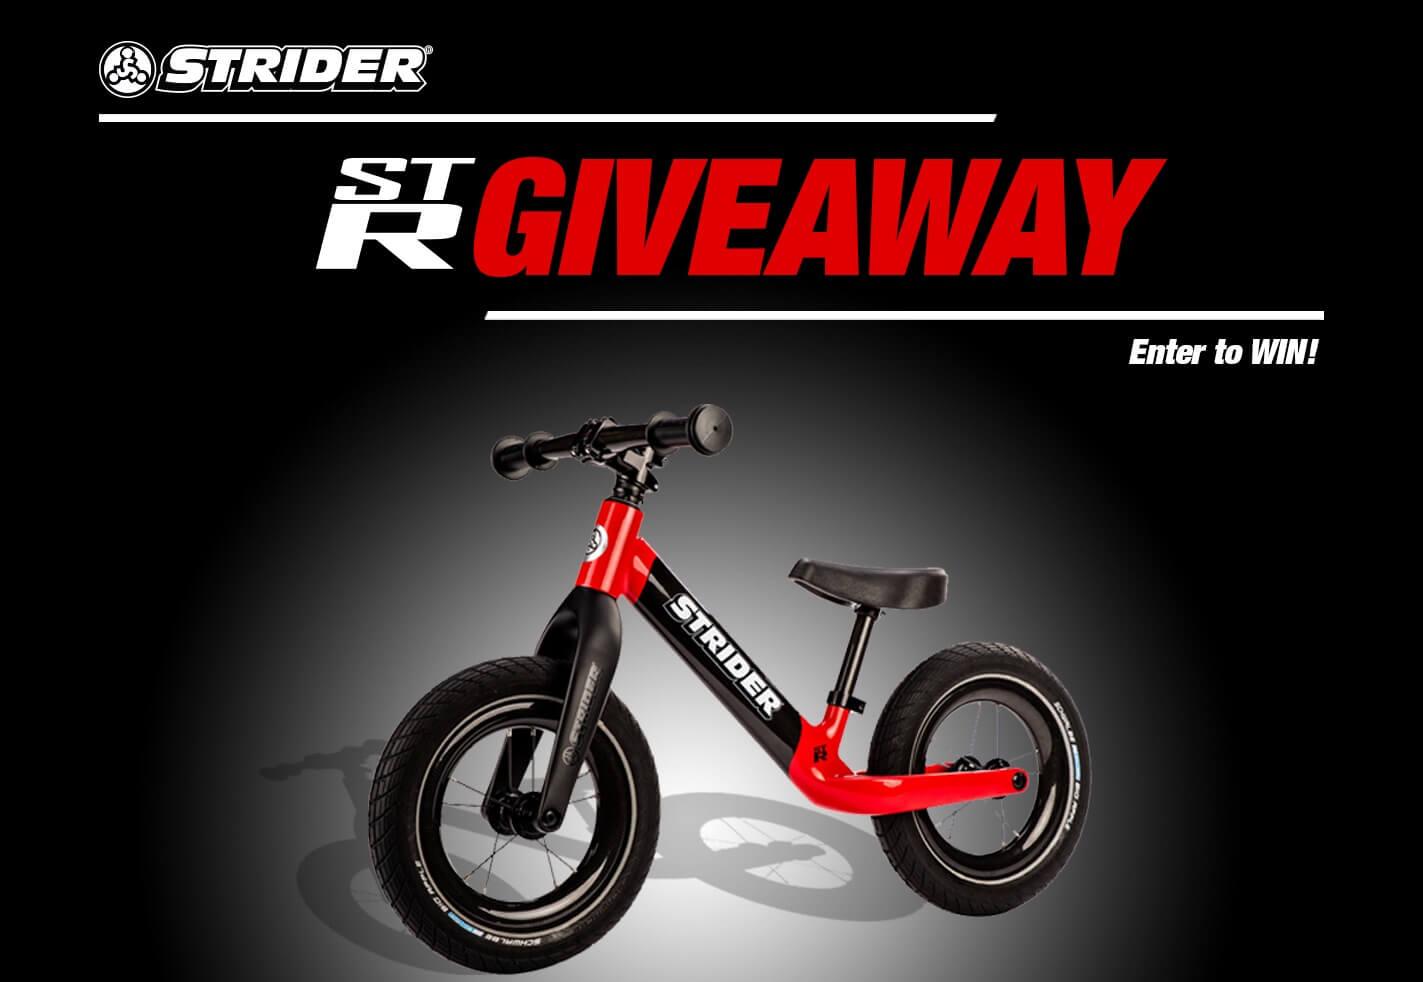 ST-R Carbon Fiber Bike Giveaway - Enter to Win | Strider Balance Bikes